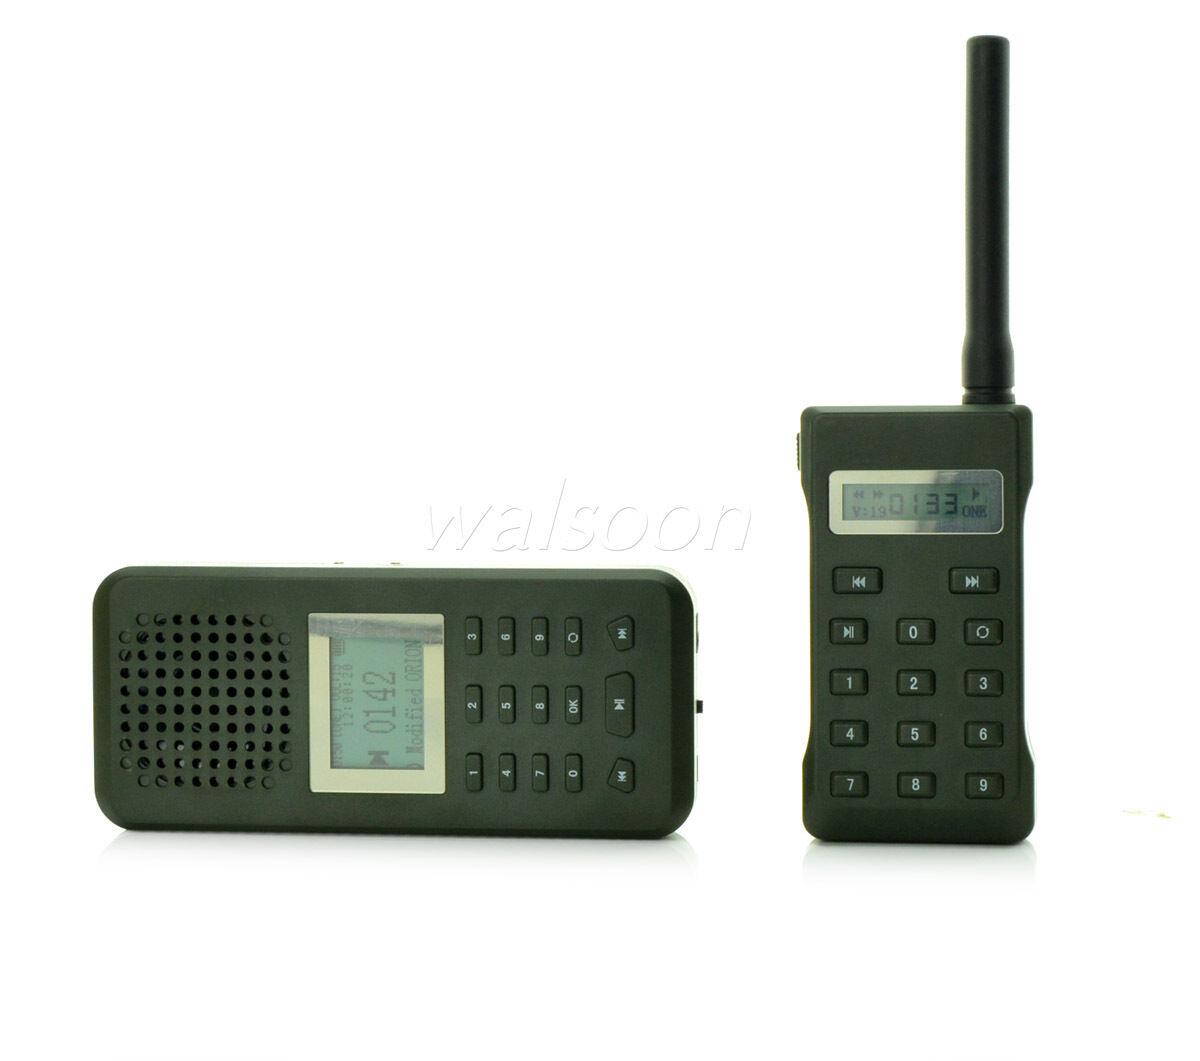 Hunting MP3 Player Bird Caller 20W 126dB Speaker LCD Display W Remote 800 Meter